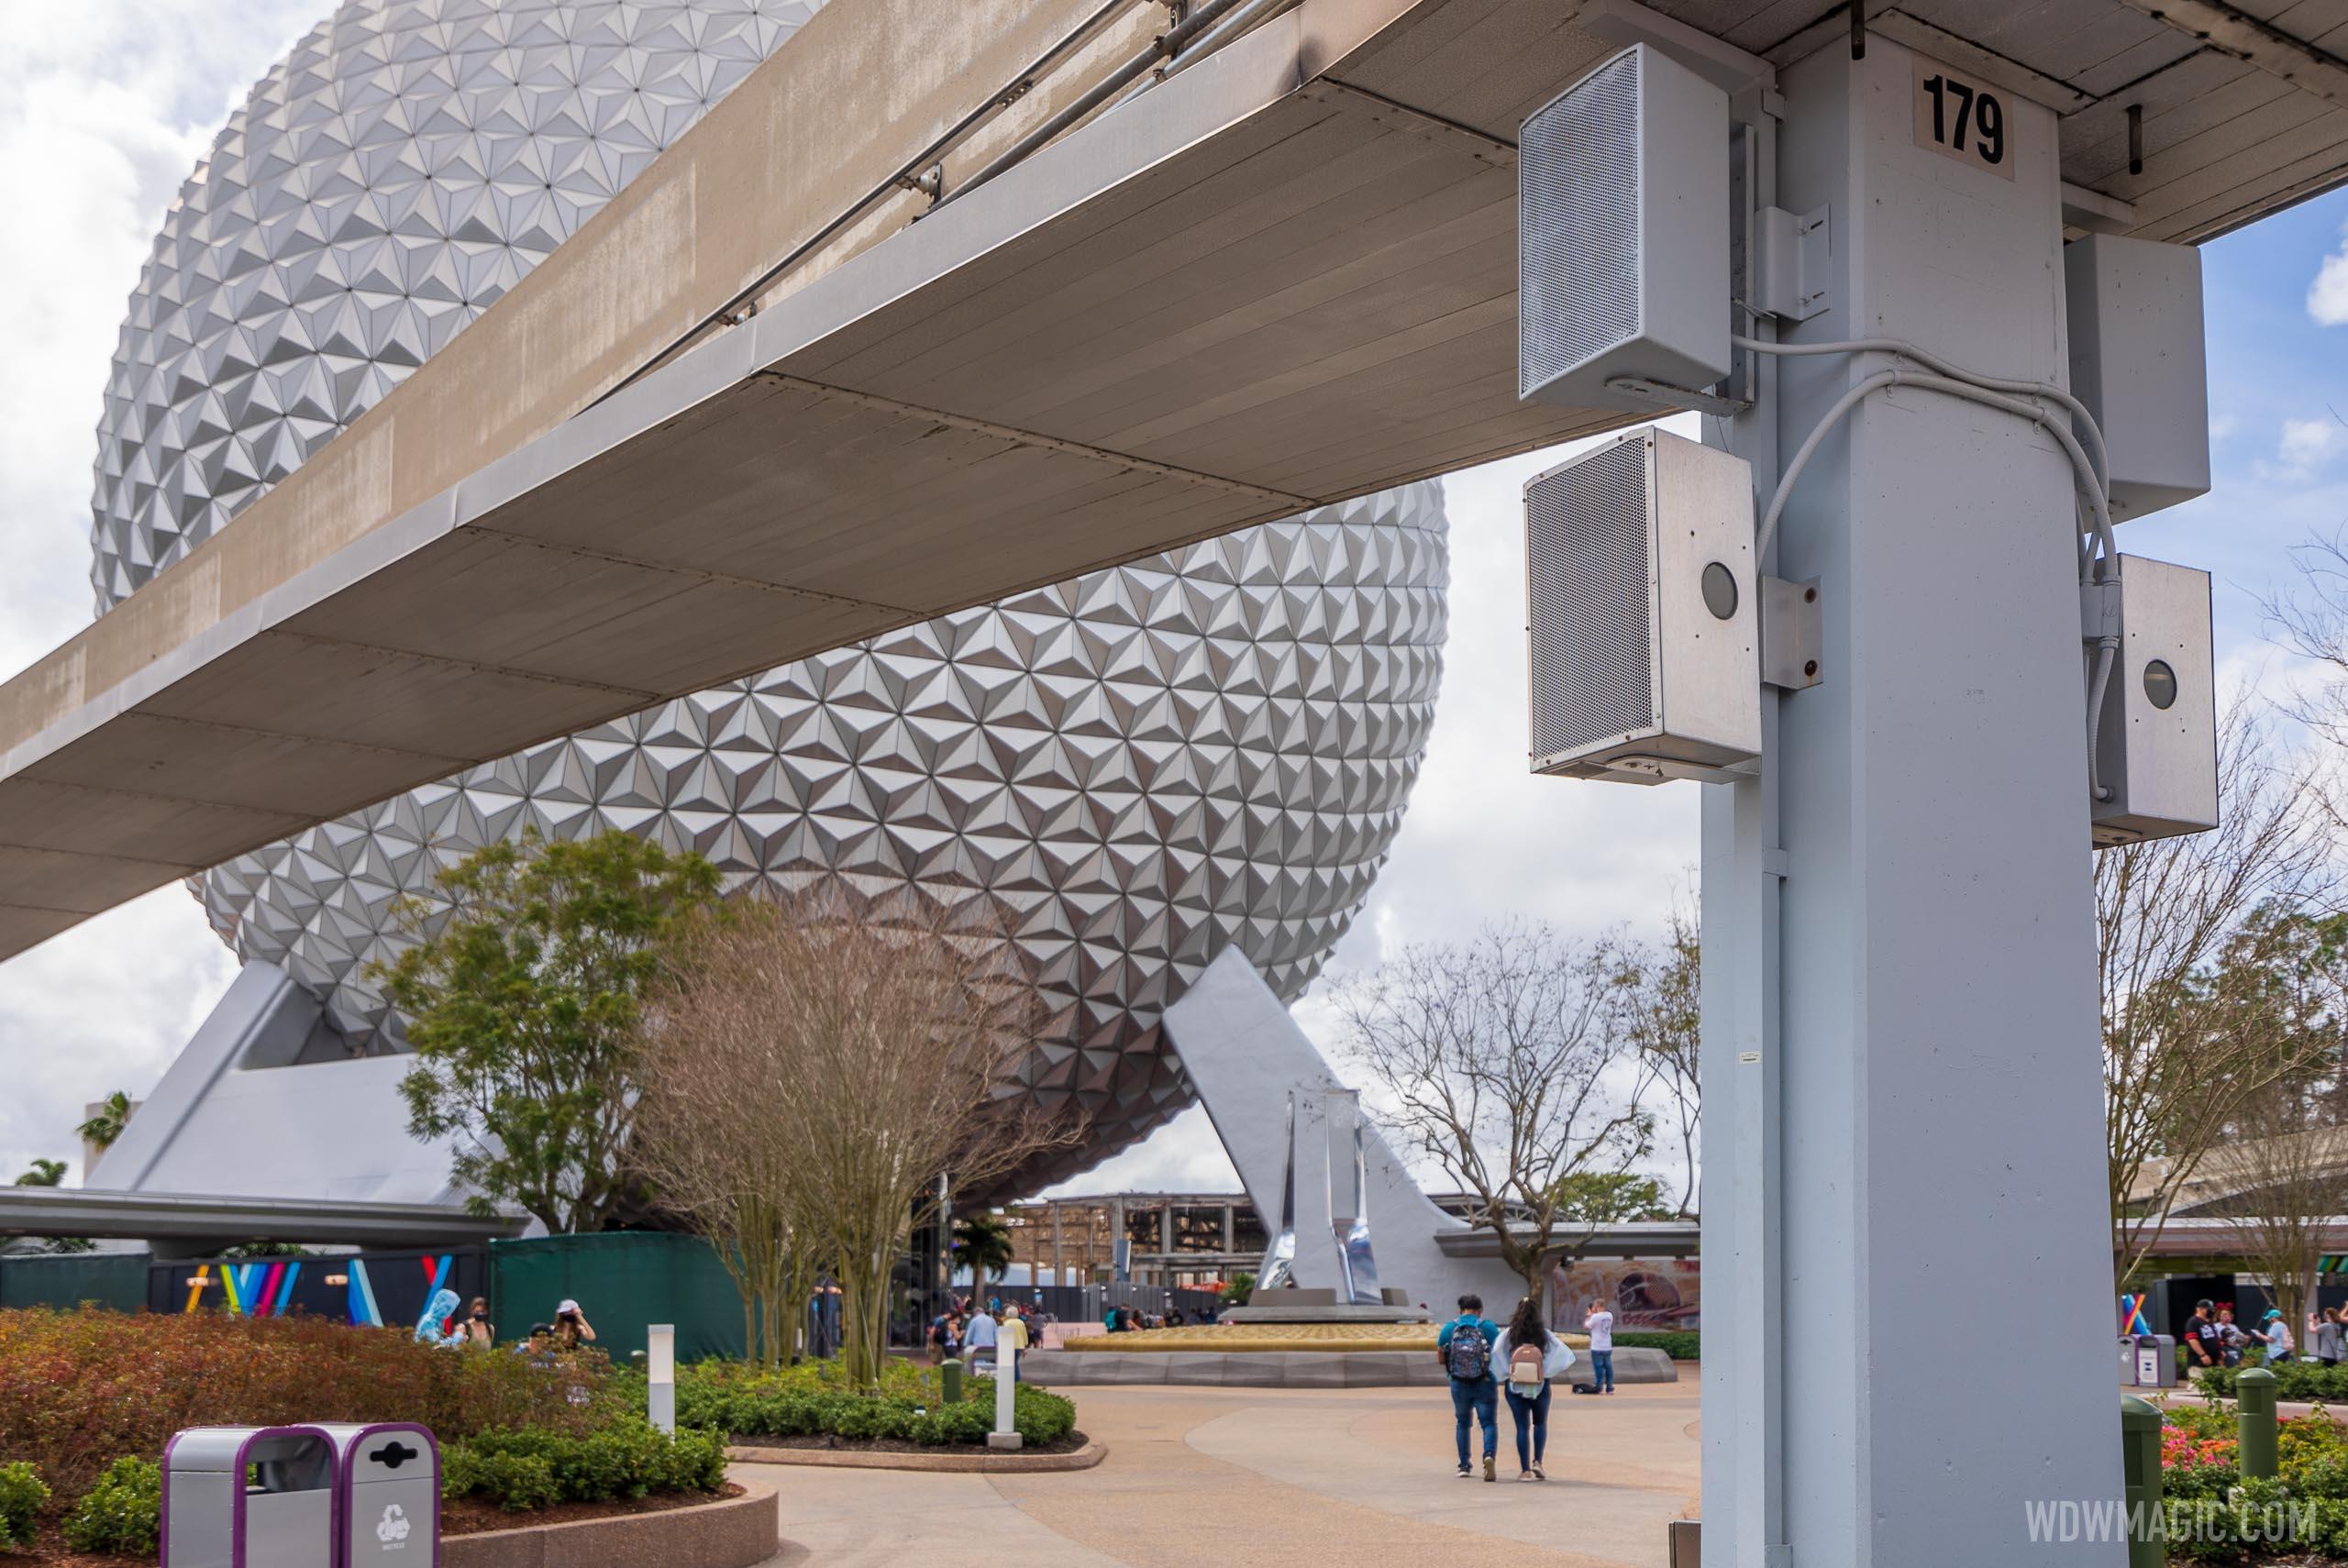 New speakers around Spaceship Earth